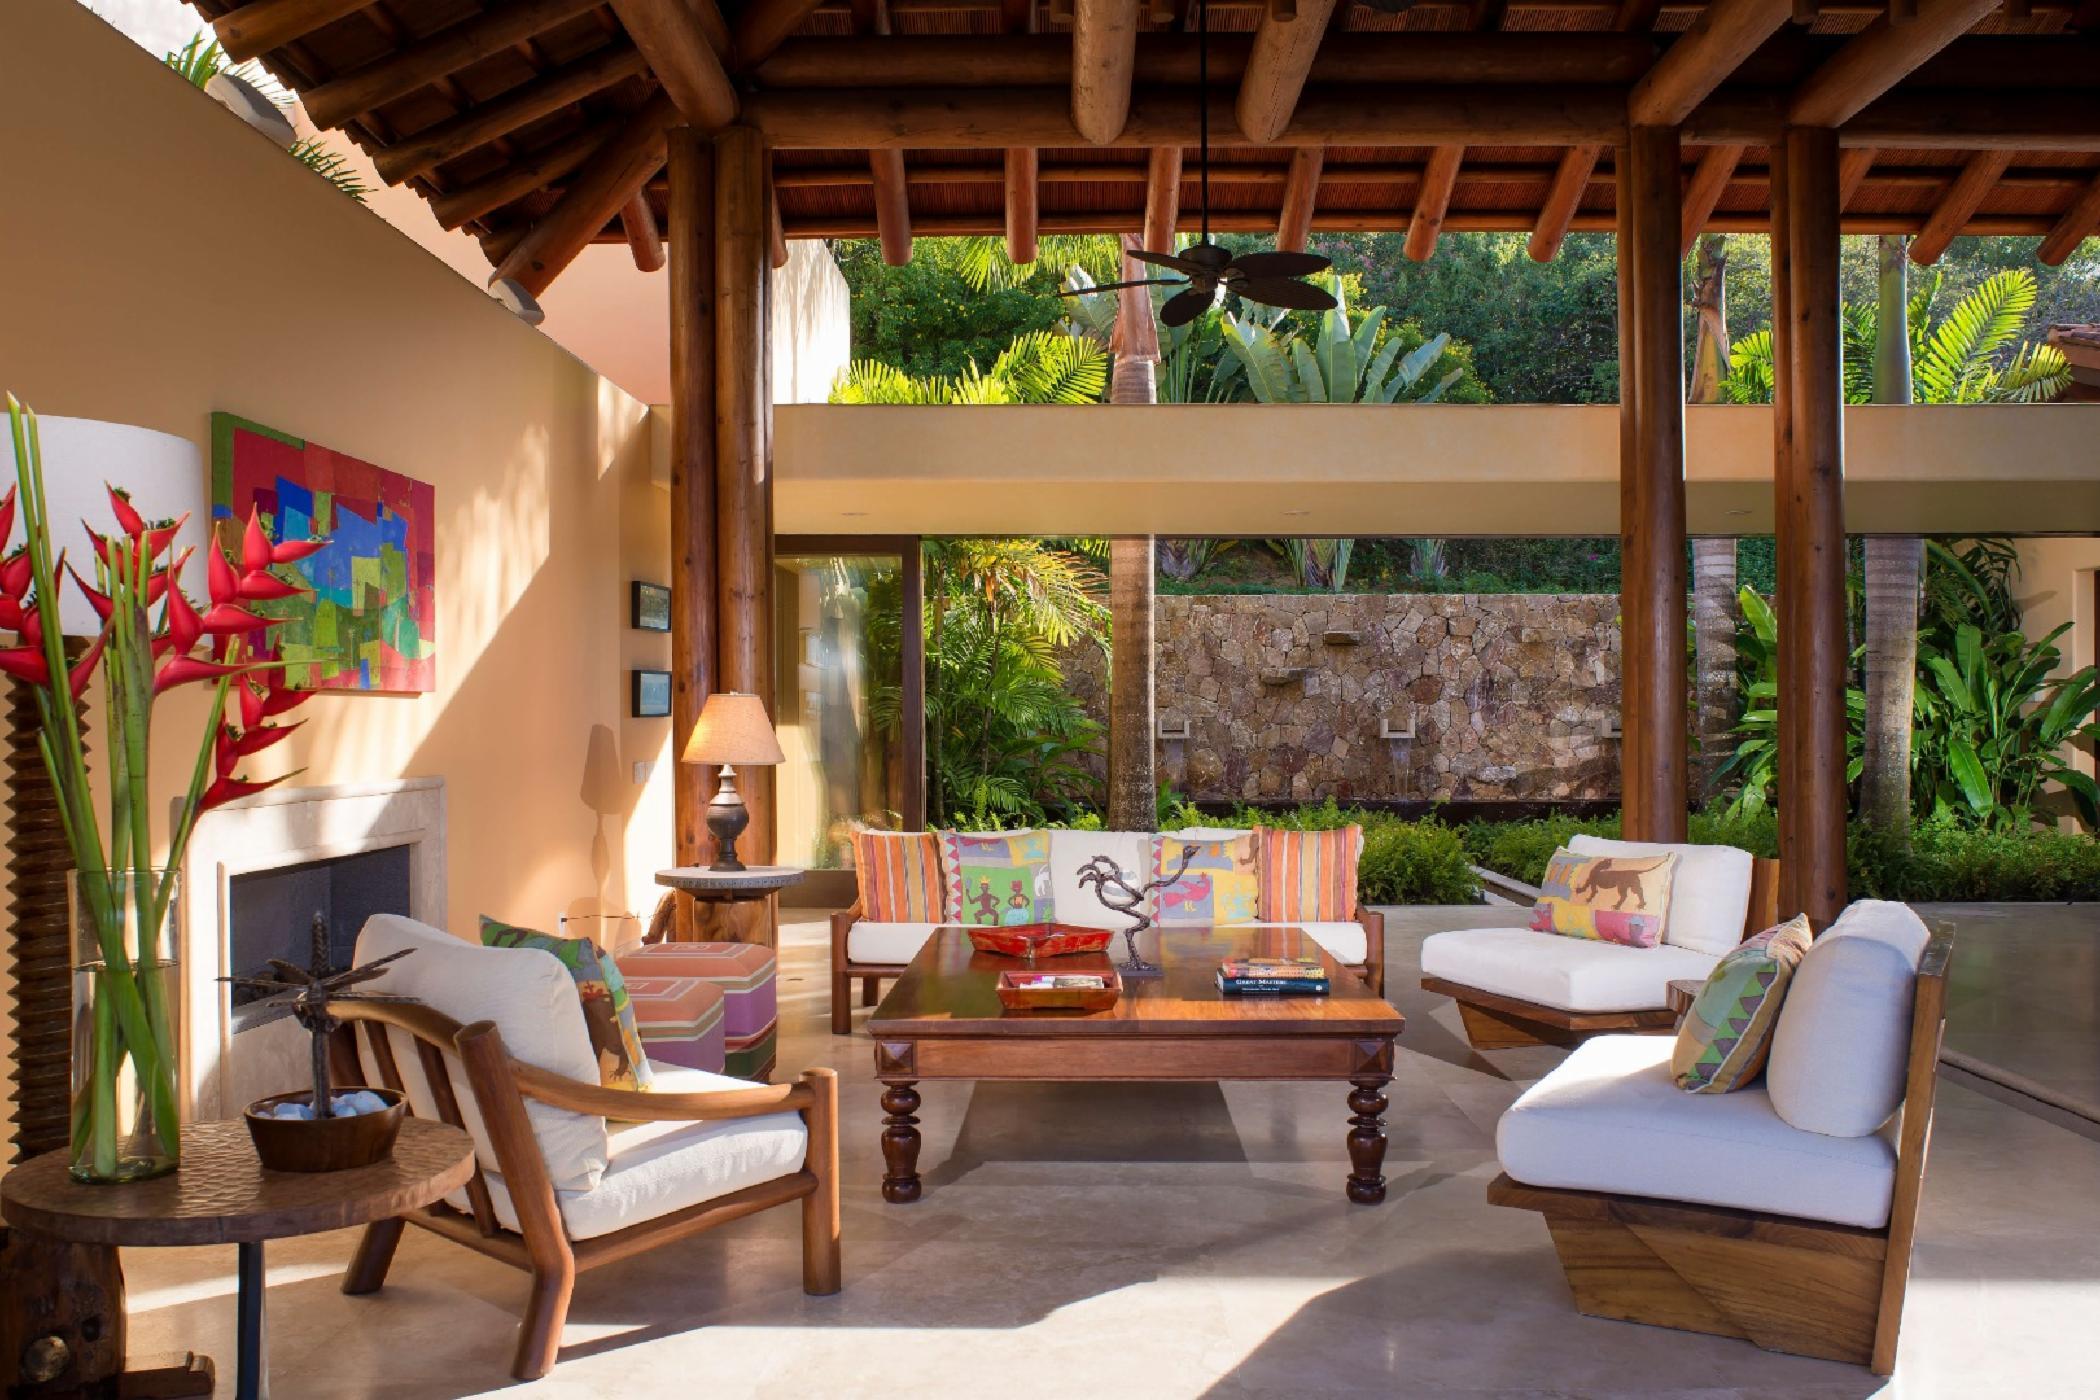 The living room is open to the ocean breezes